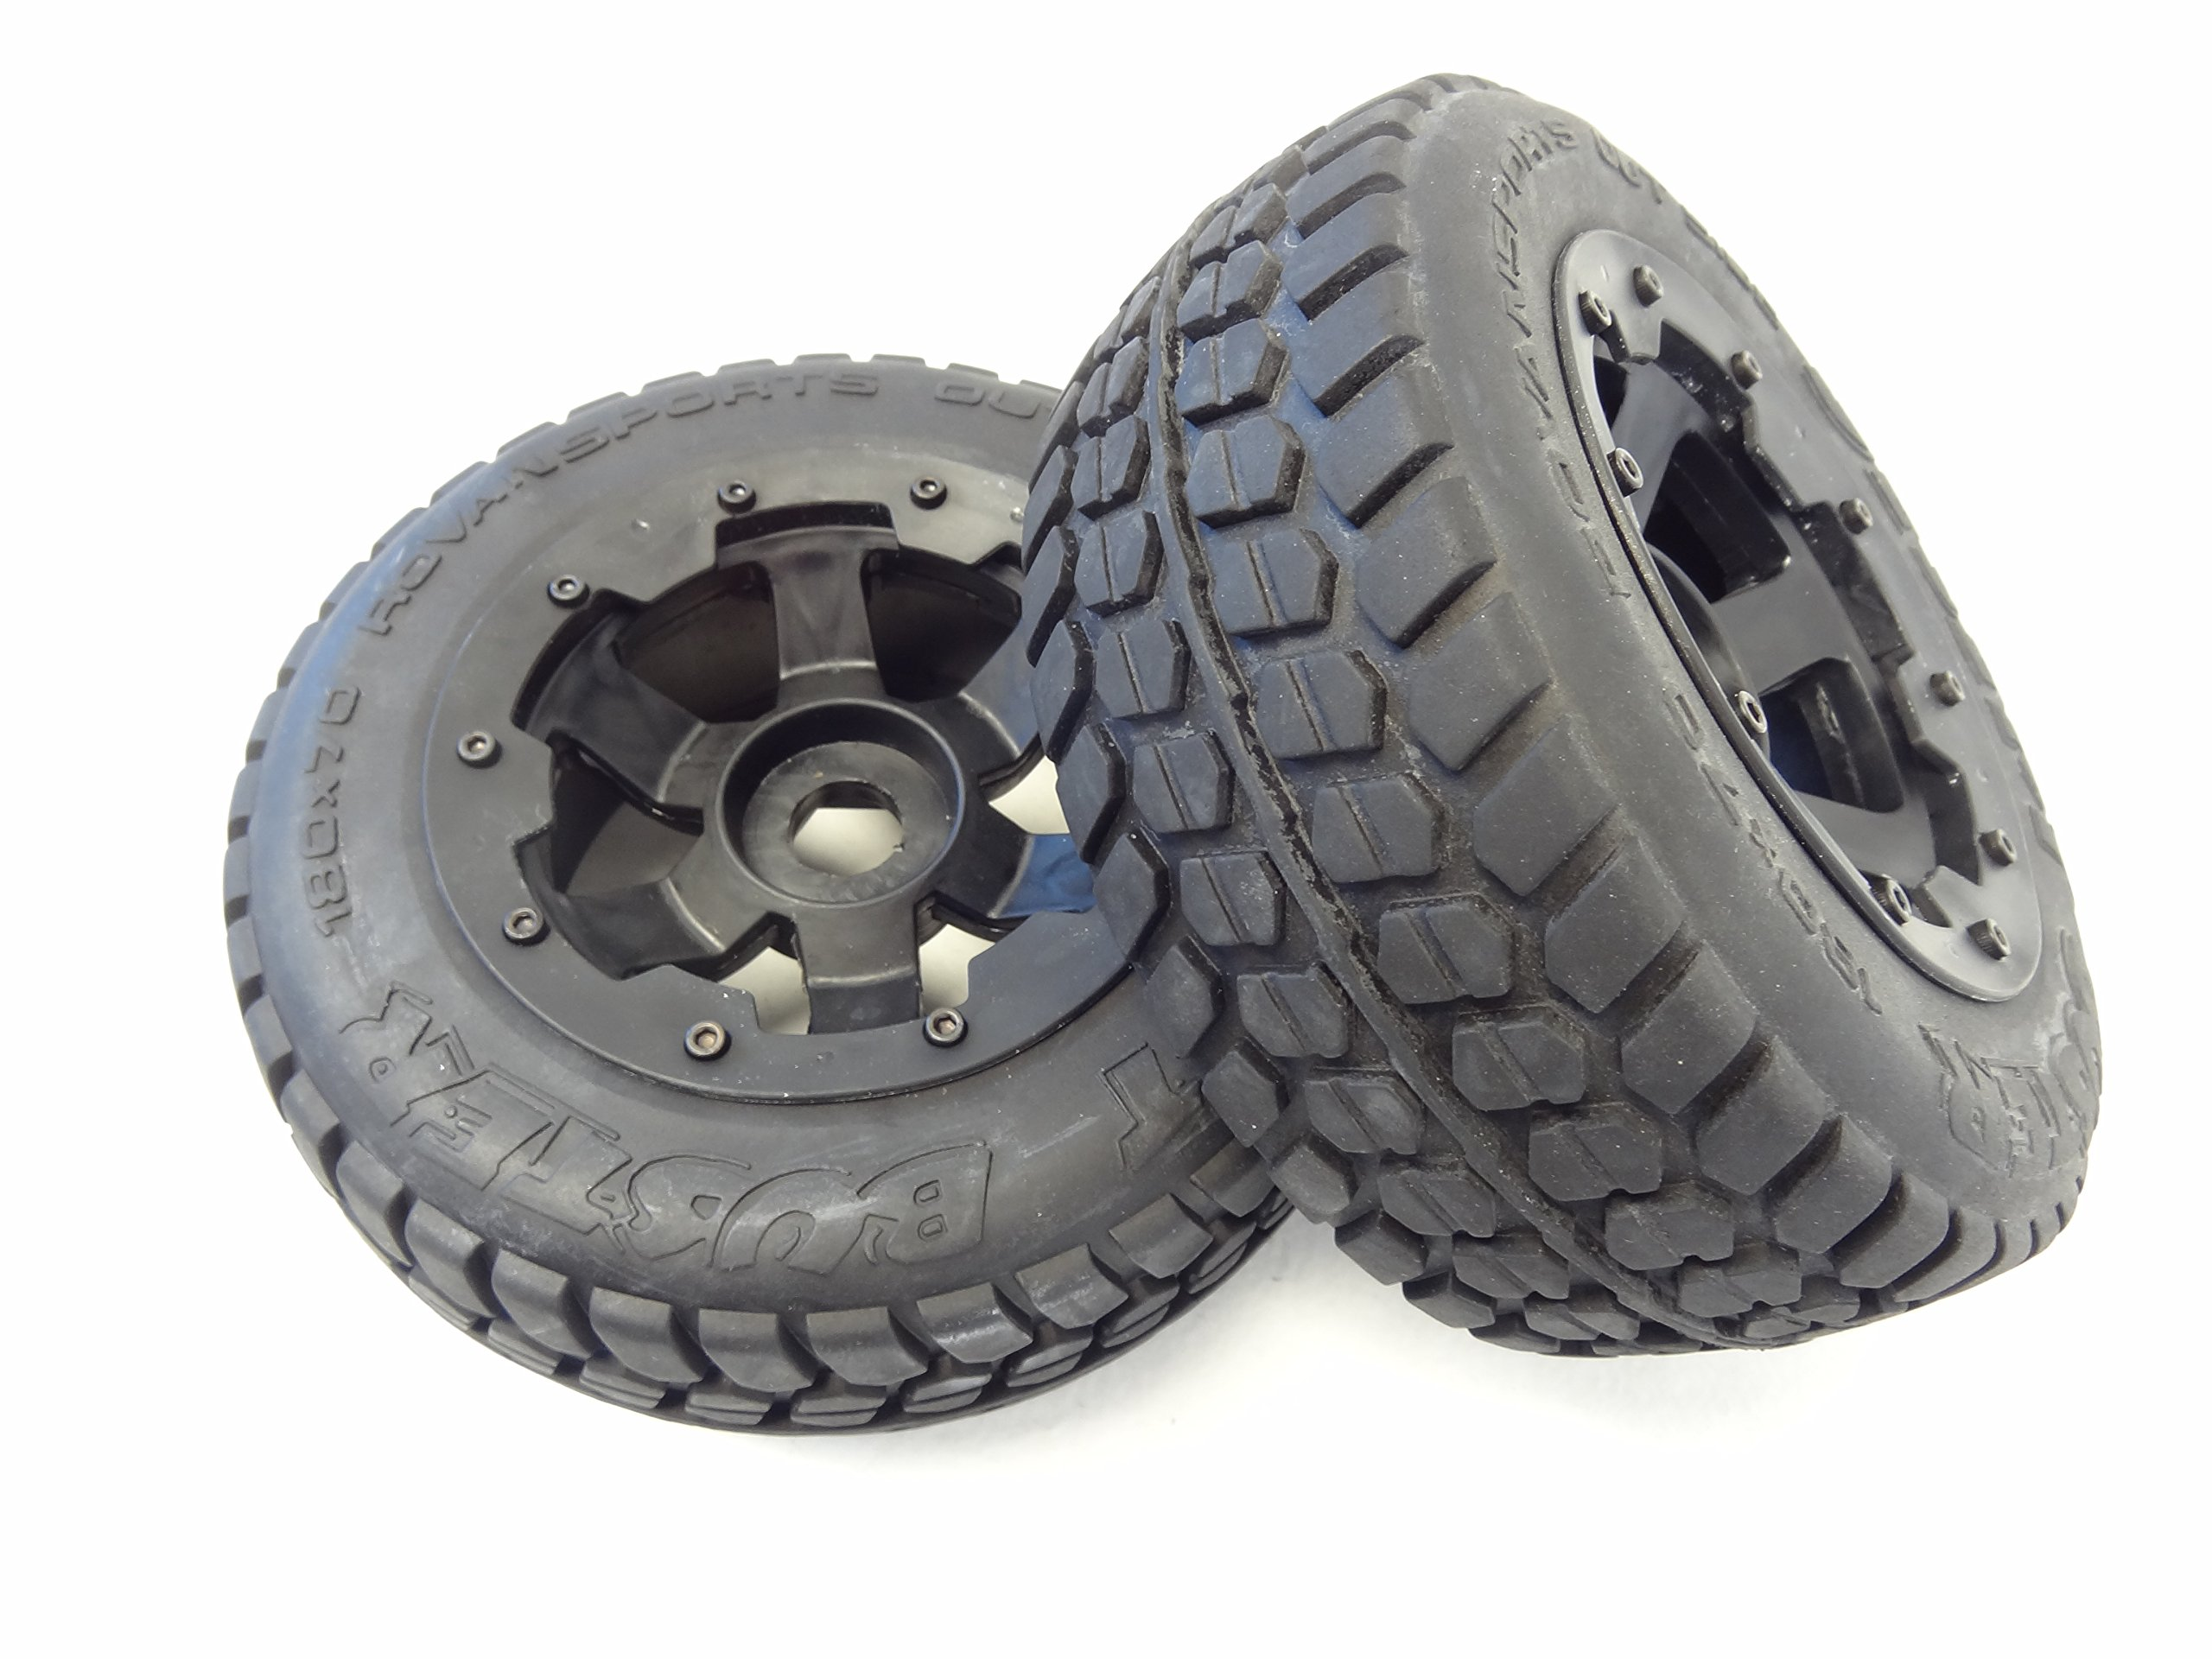 1/5 Rovan Terminator Rear Truck Road Wheels HPI Baja 5T 5SC King Motor LOSI 5IVE